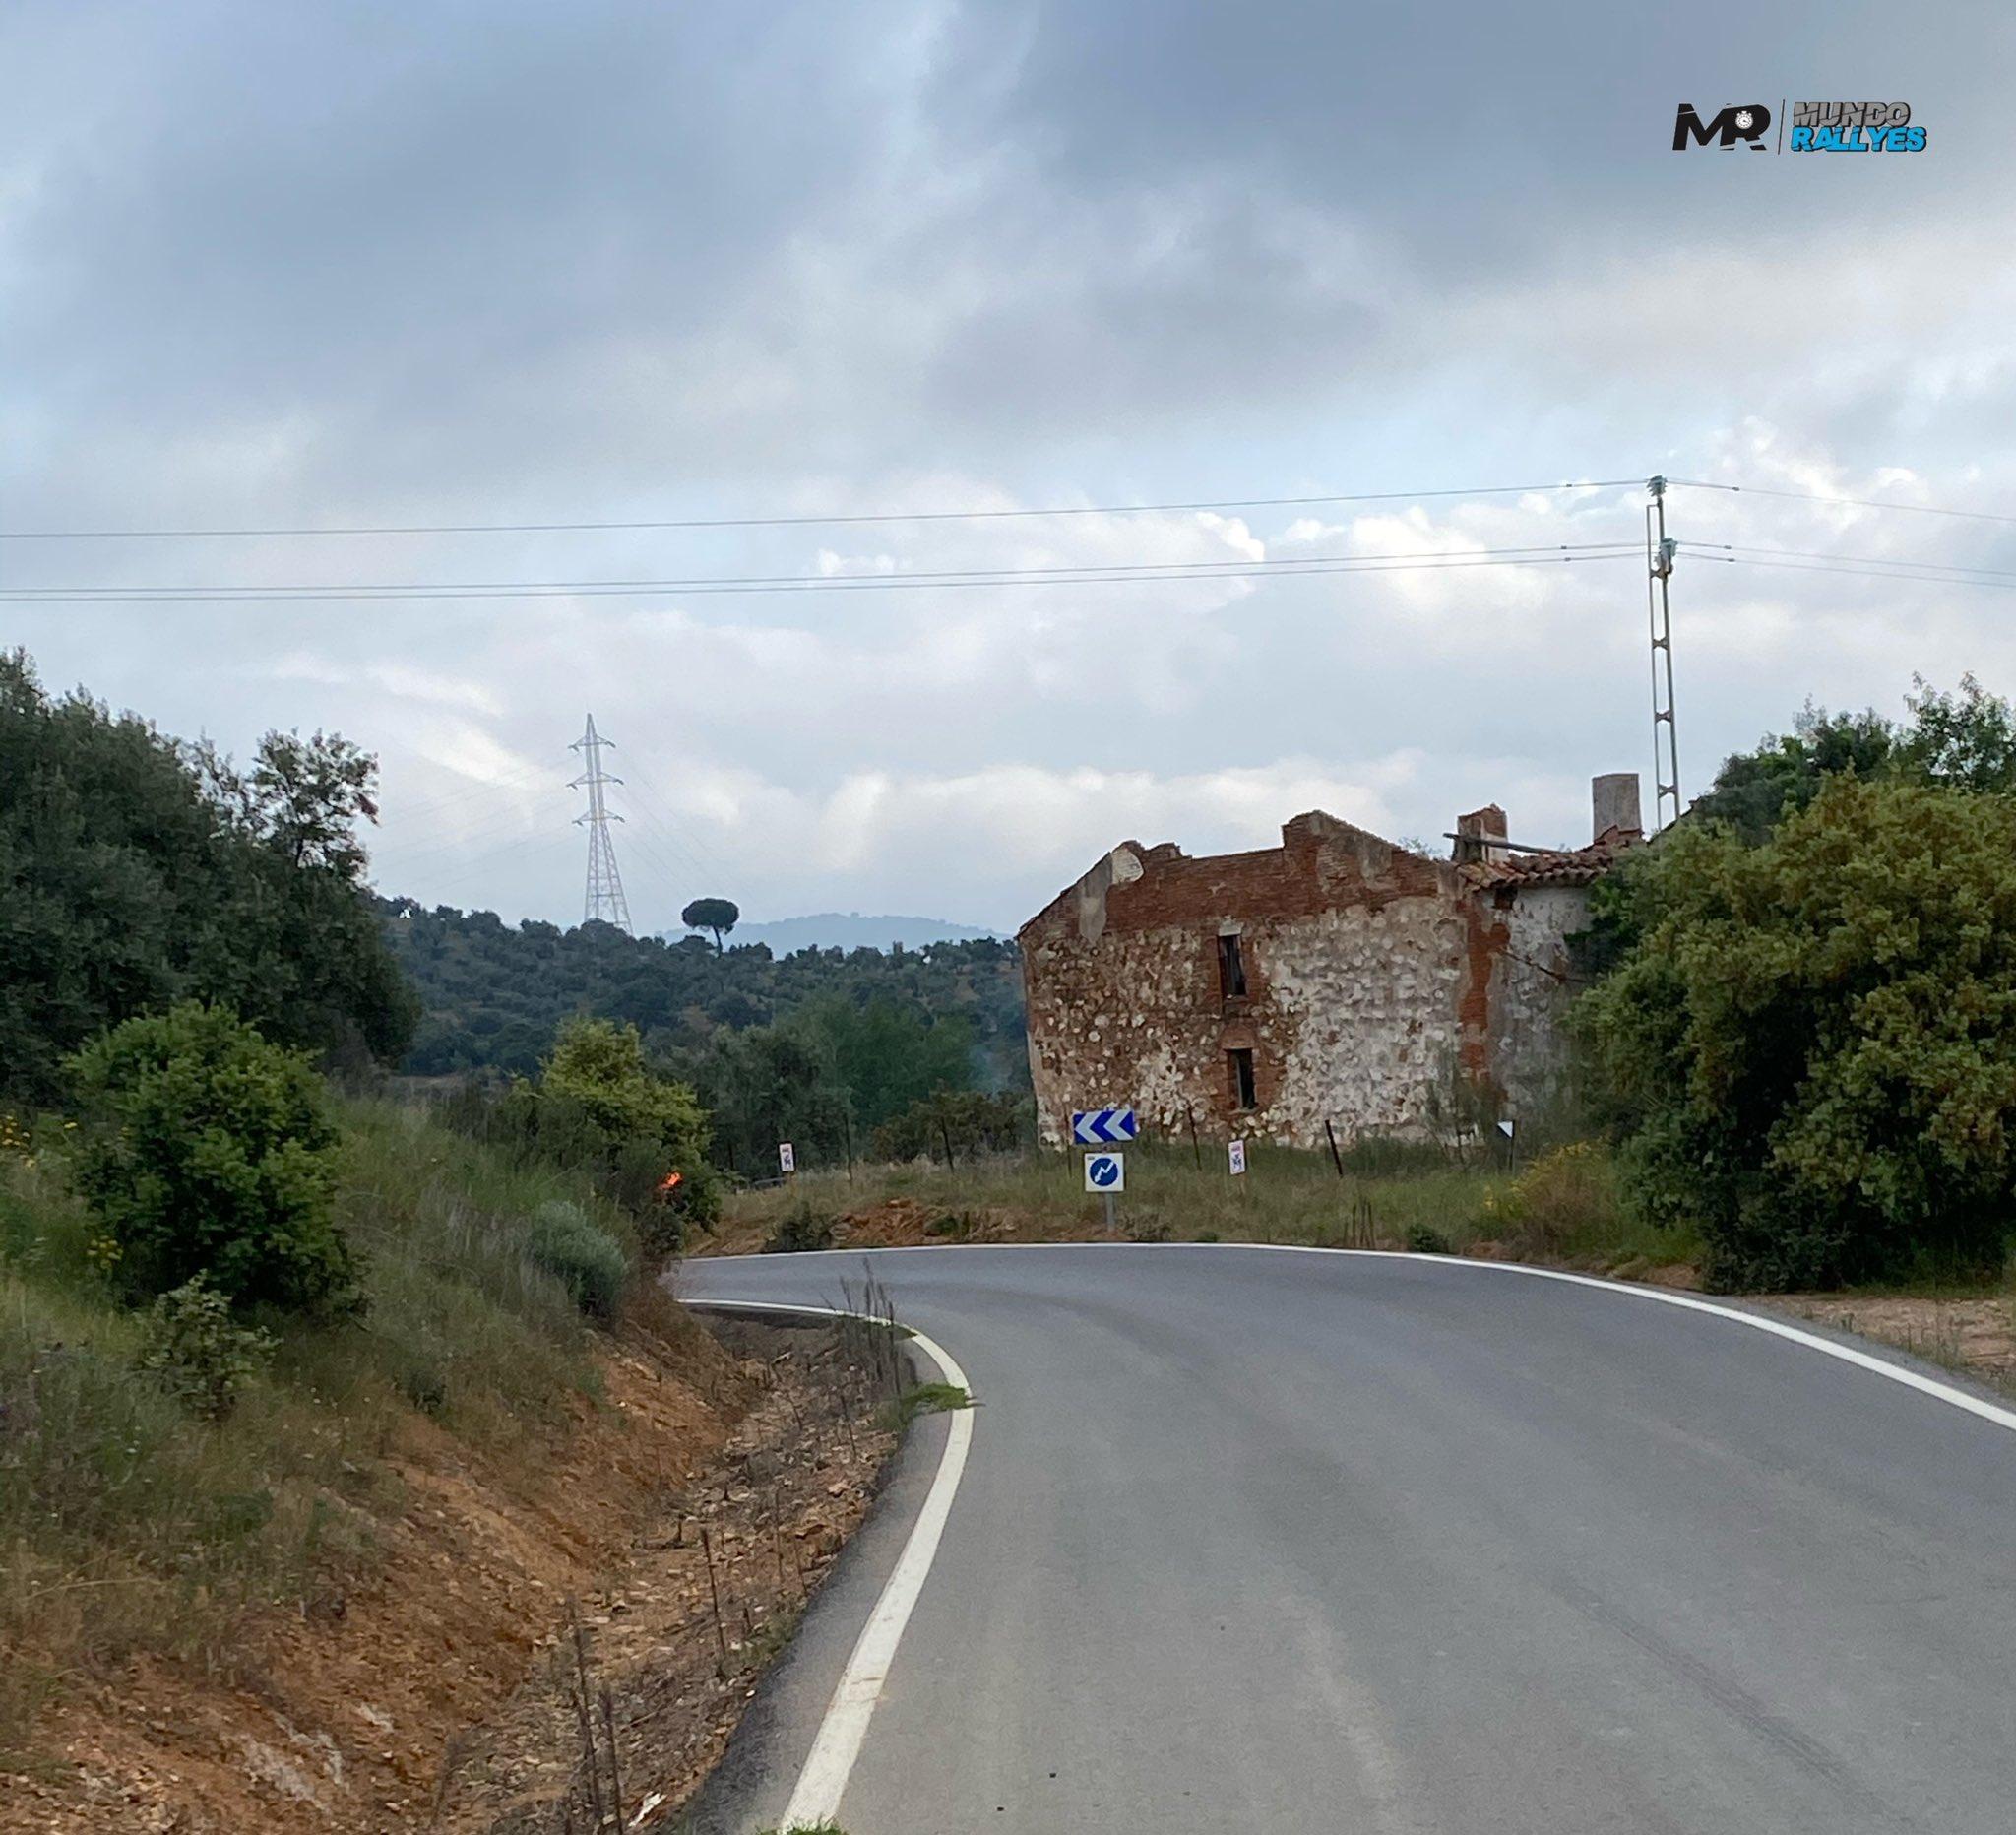 SCER + CERA + CERVH: 38º Rallye Sierra Morena - Internacional [8-10 Abril] - Página 4 EymGYsWXEAAJtQd?format=jpg&name=large